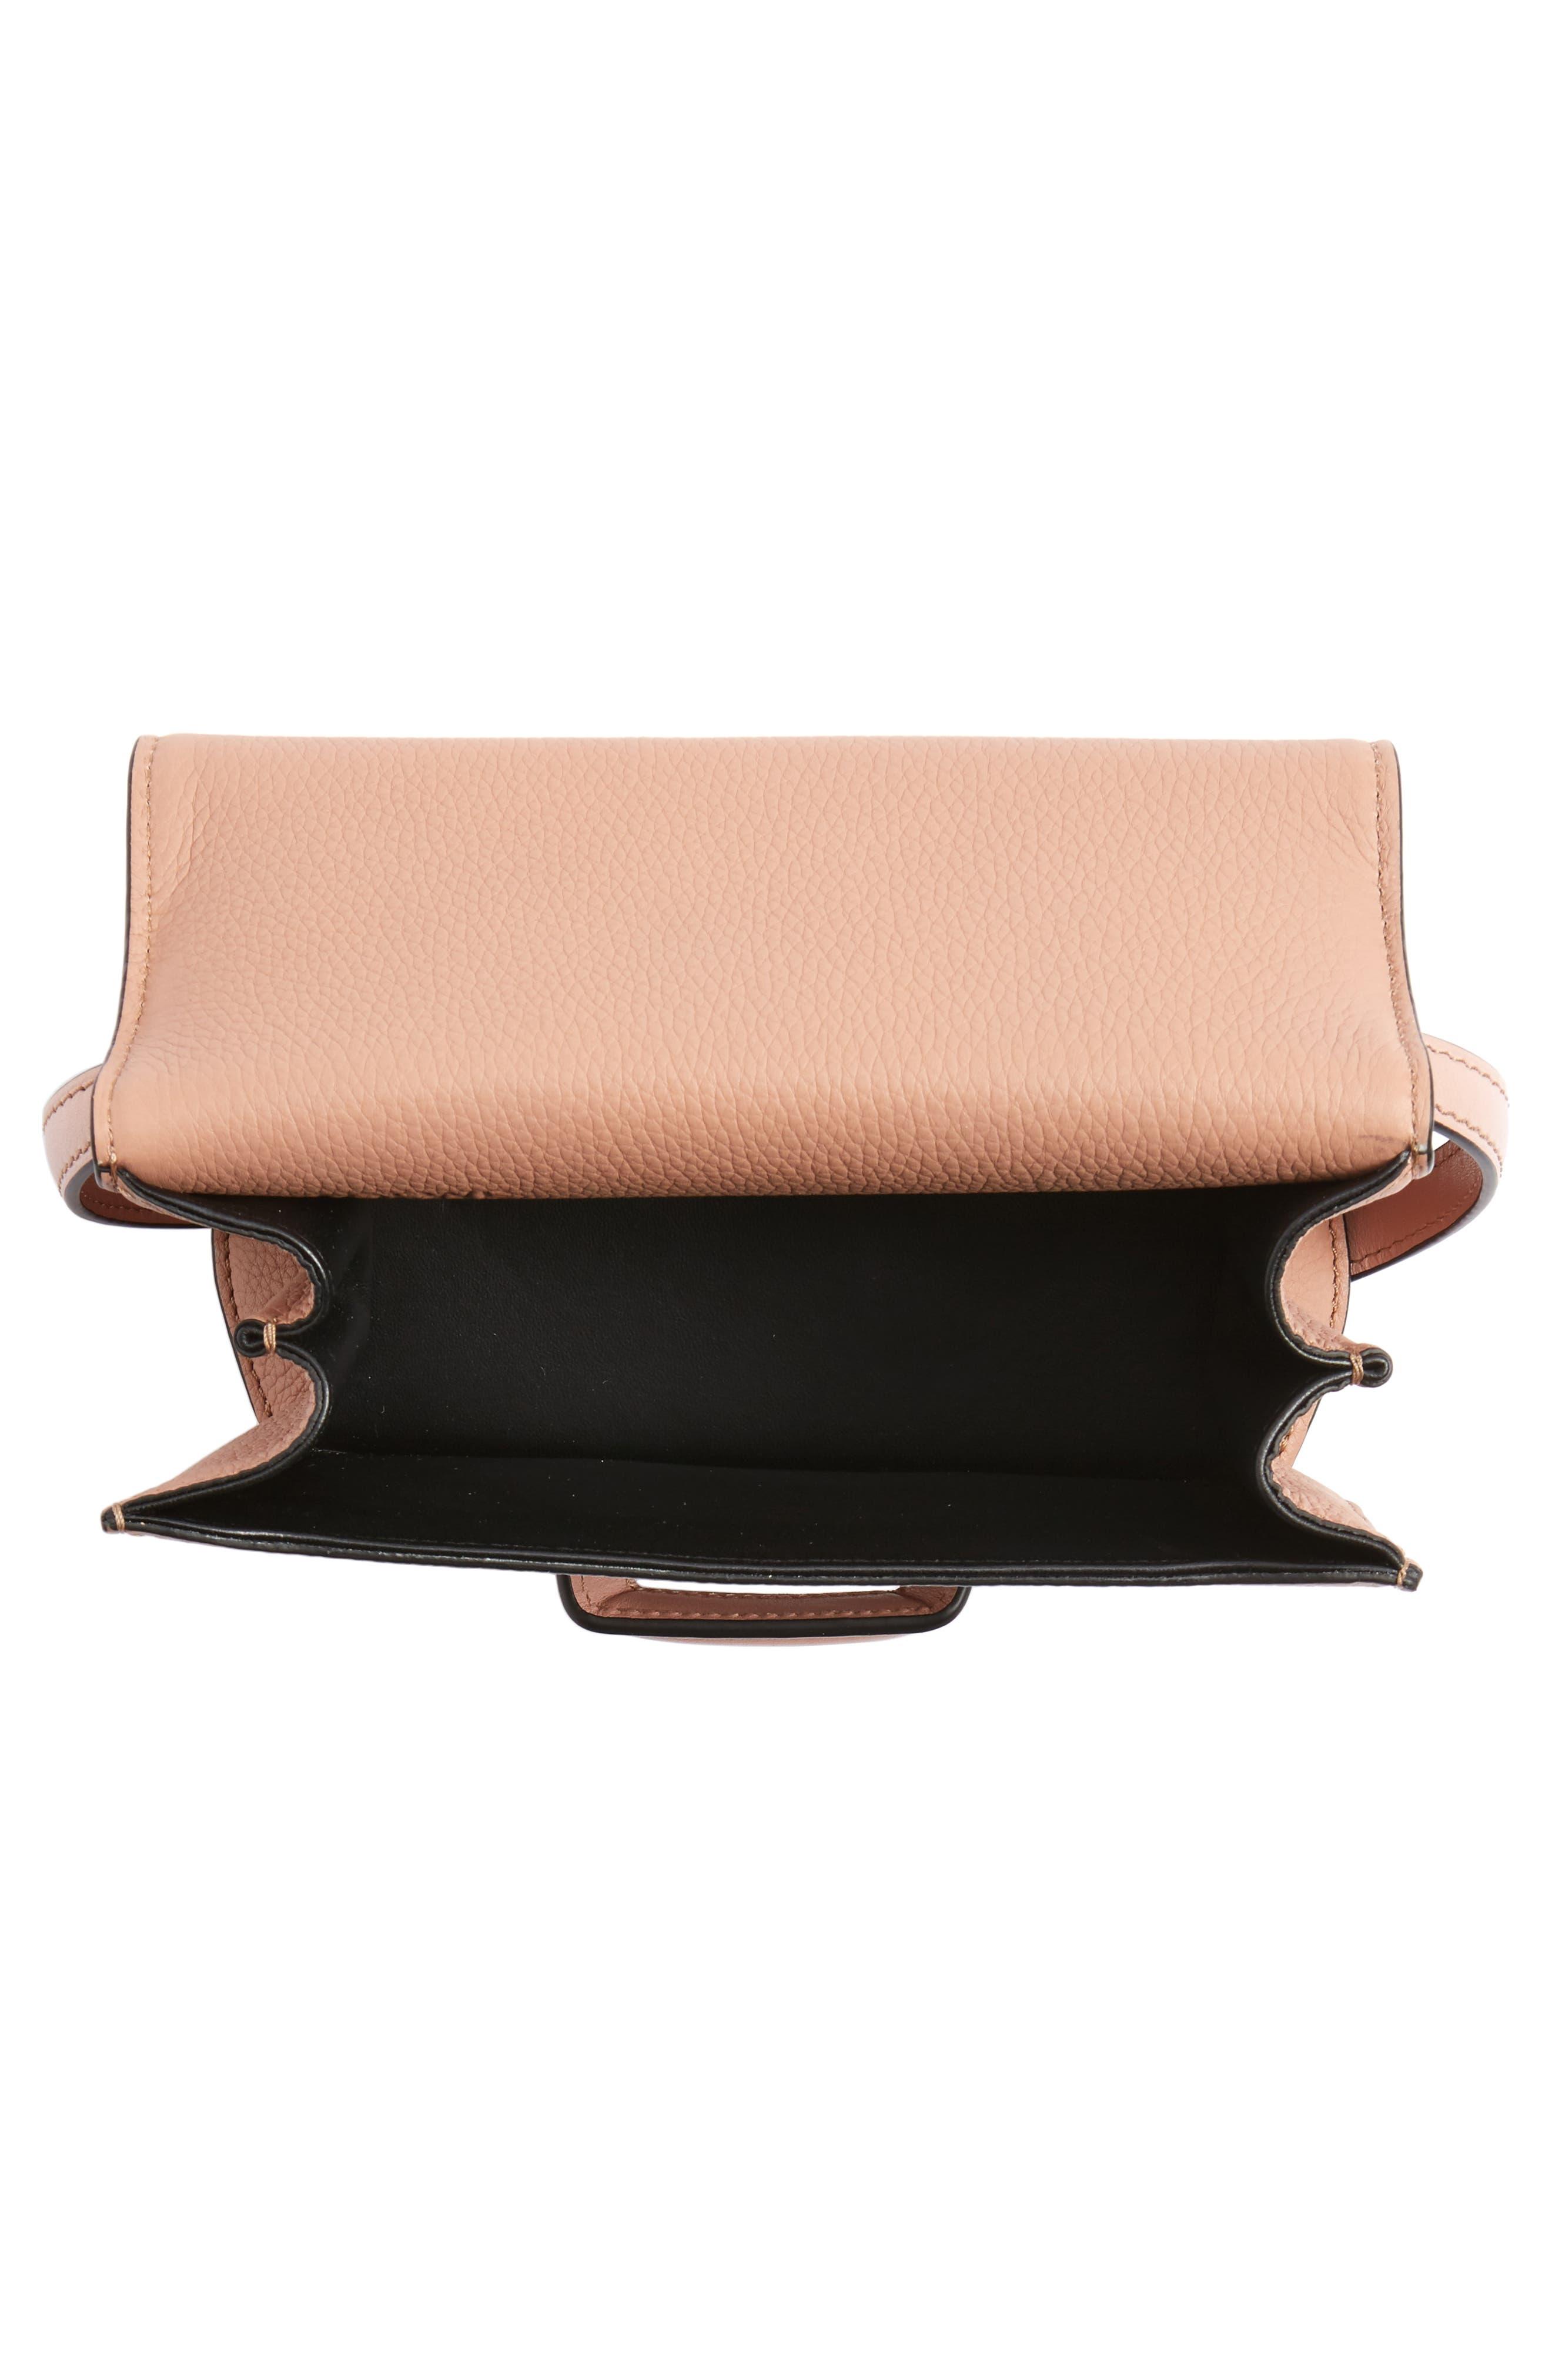 Small Barcelona Grainy Leather Crossbody Bag,                             Alternate thumbnail 4, color,                             BLUSH